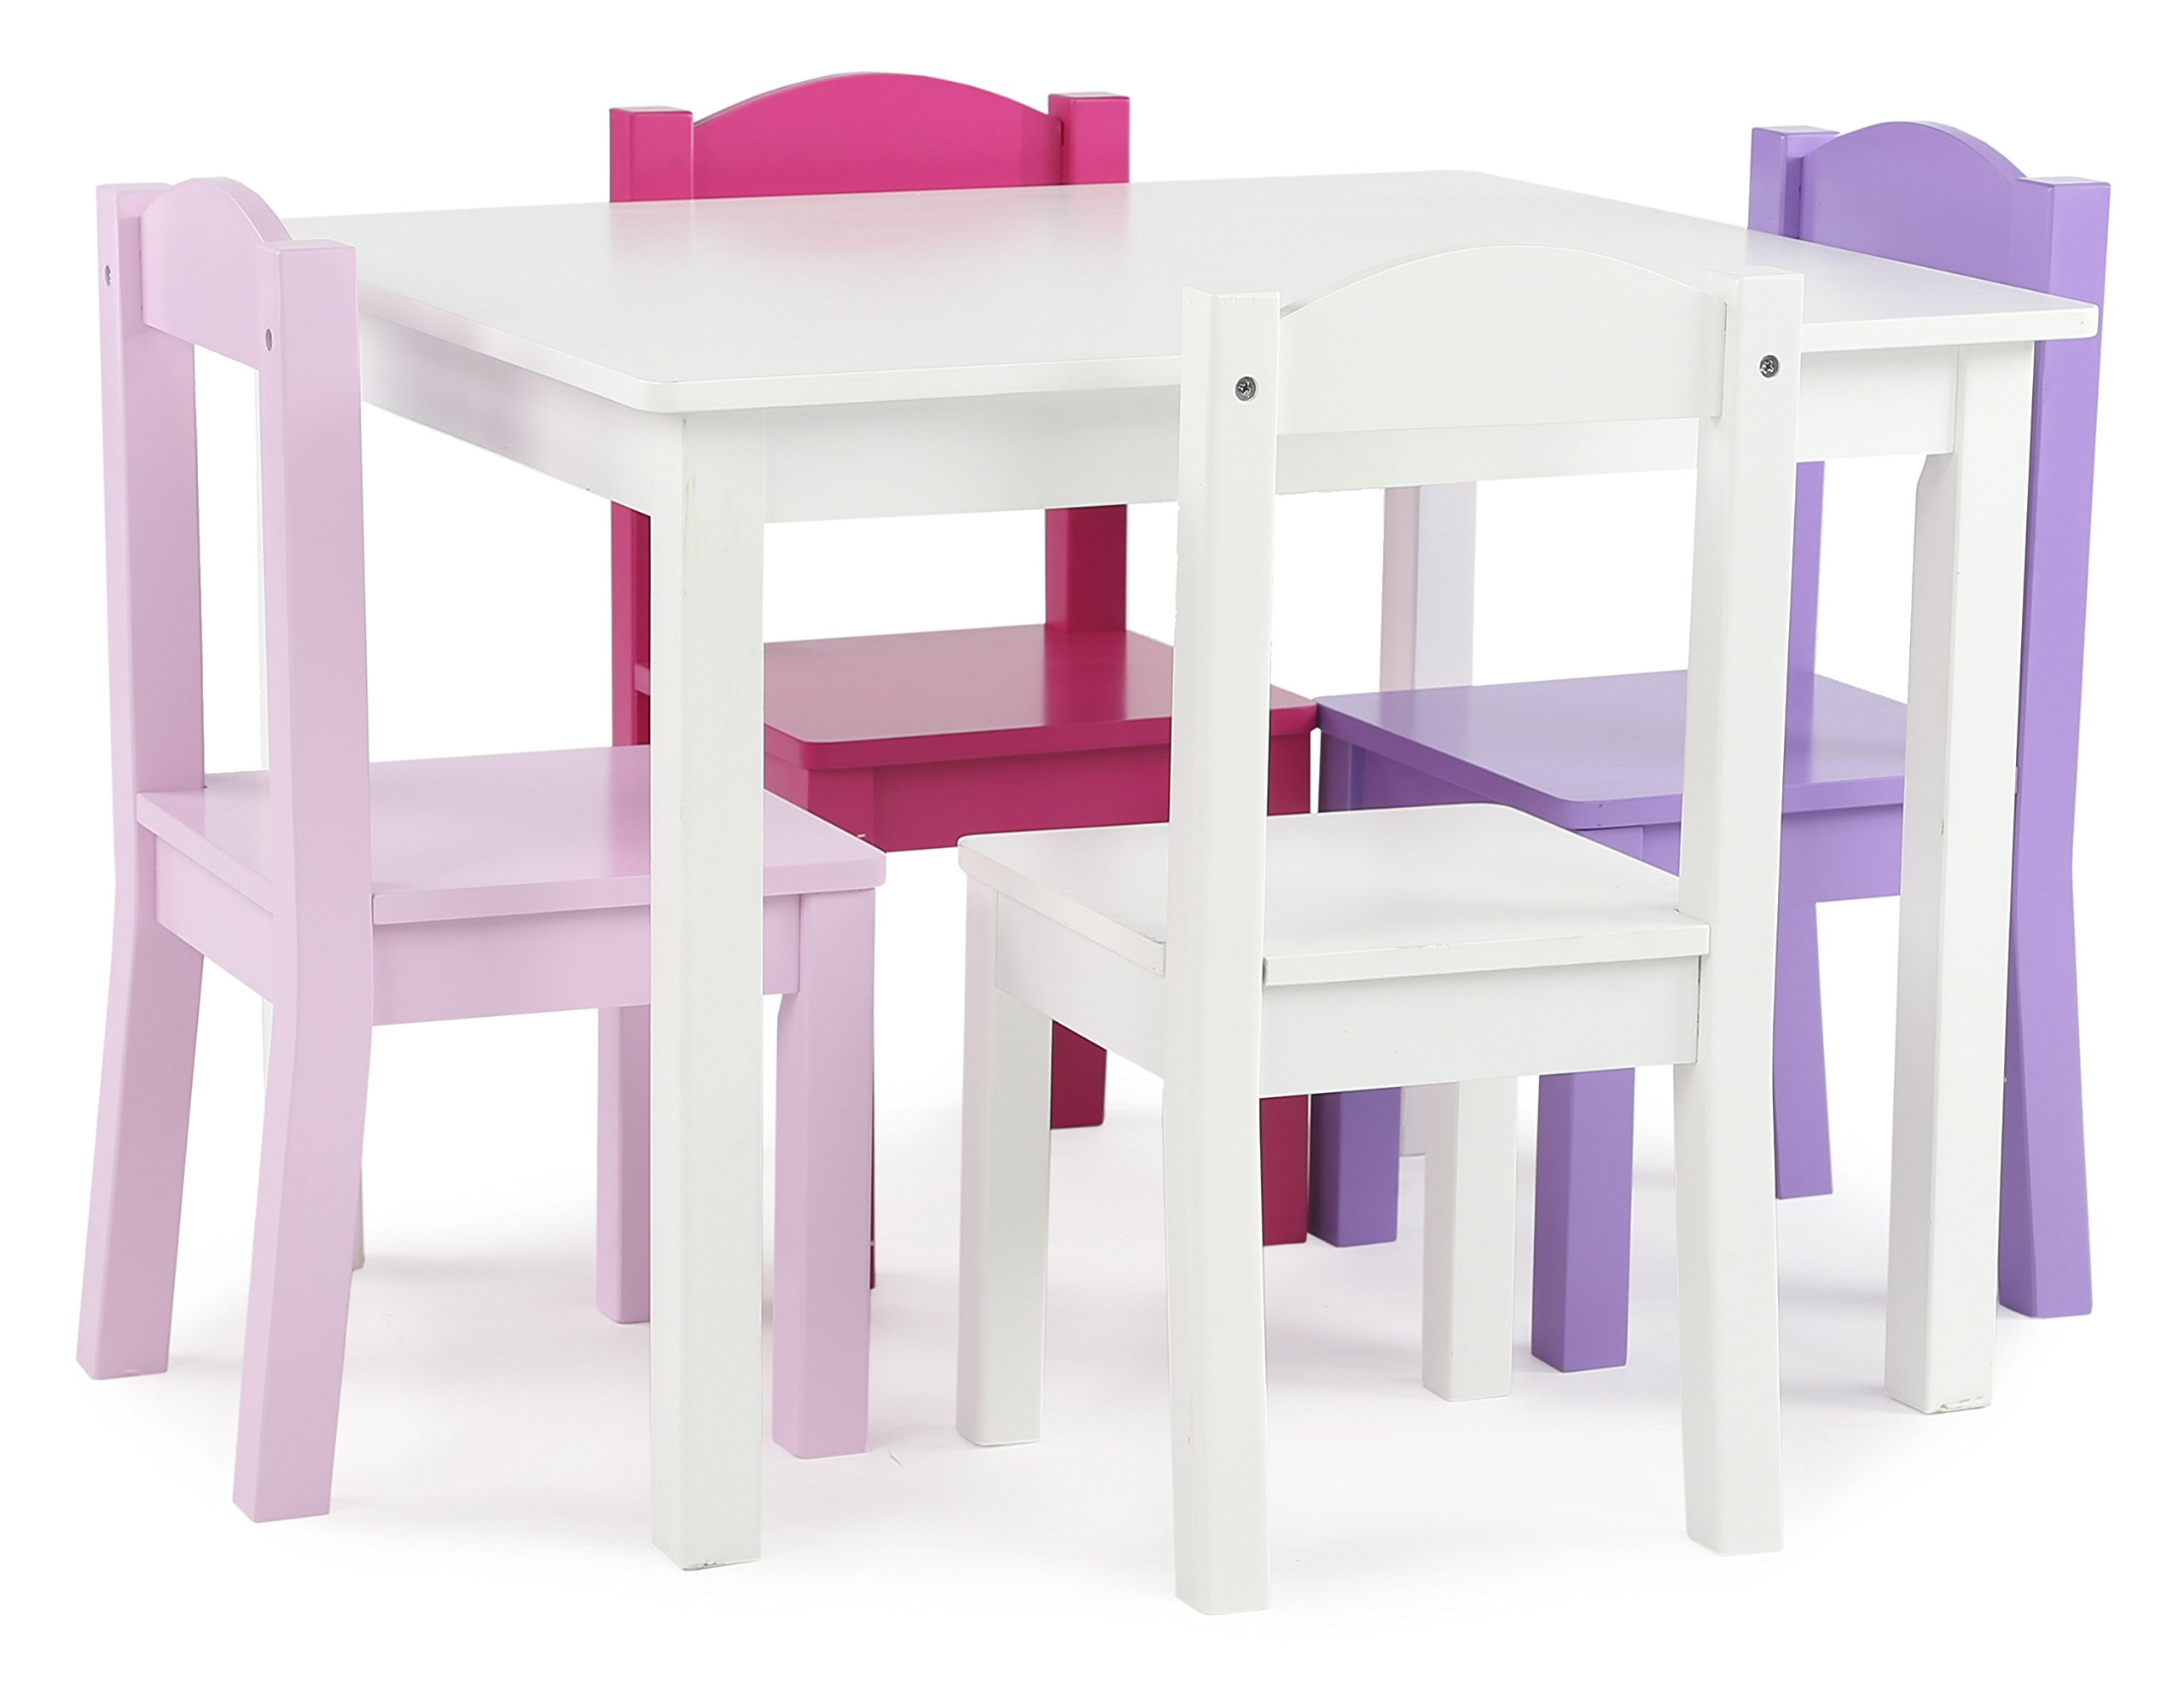 Tot Tutors TC727 Friends Collection Kids Wood Table & 4 Chair Set, White/Pink & Purple by Tot Tutors